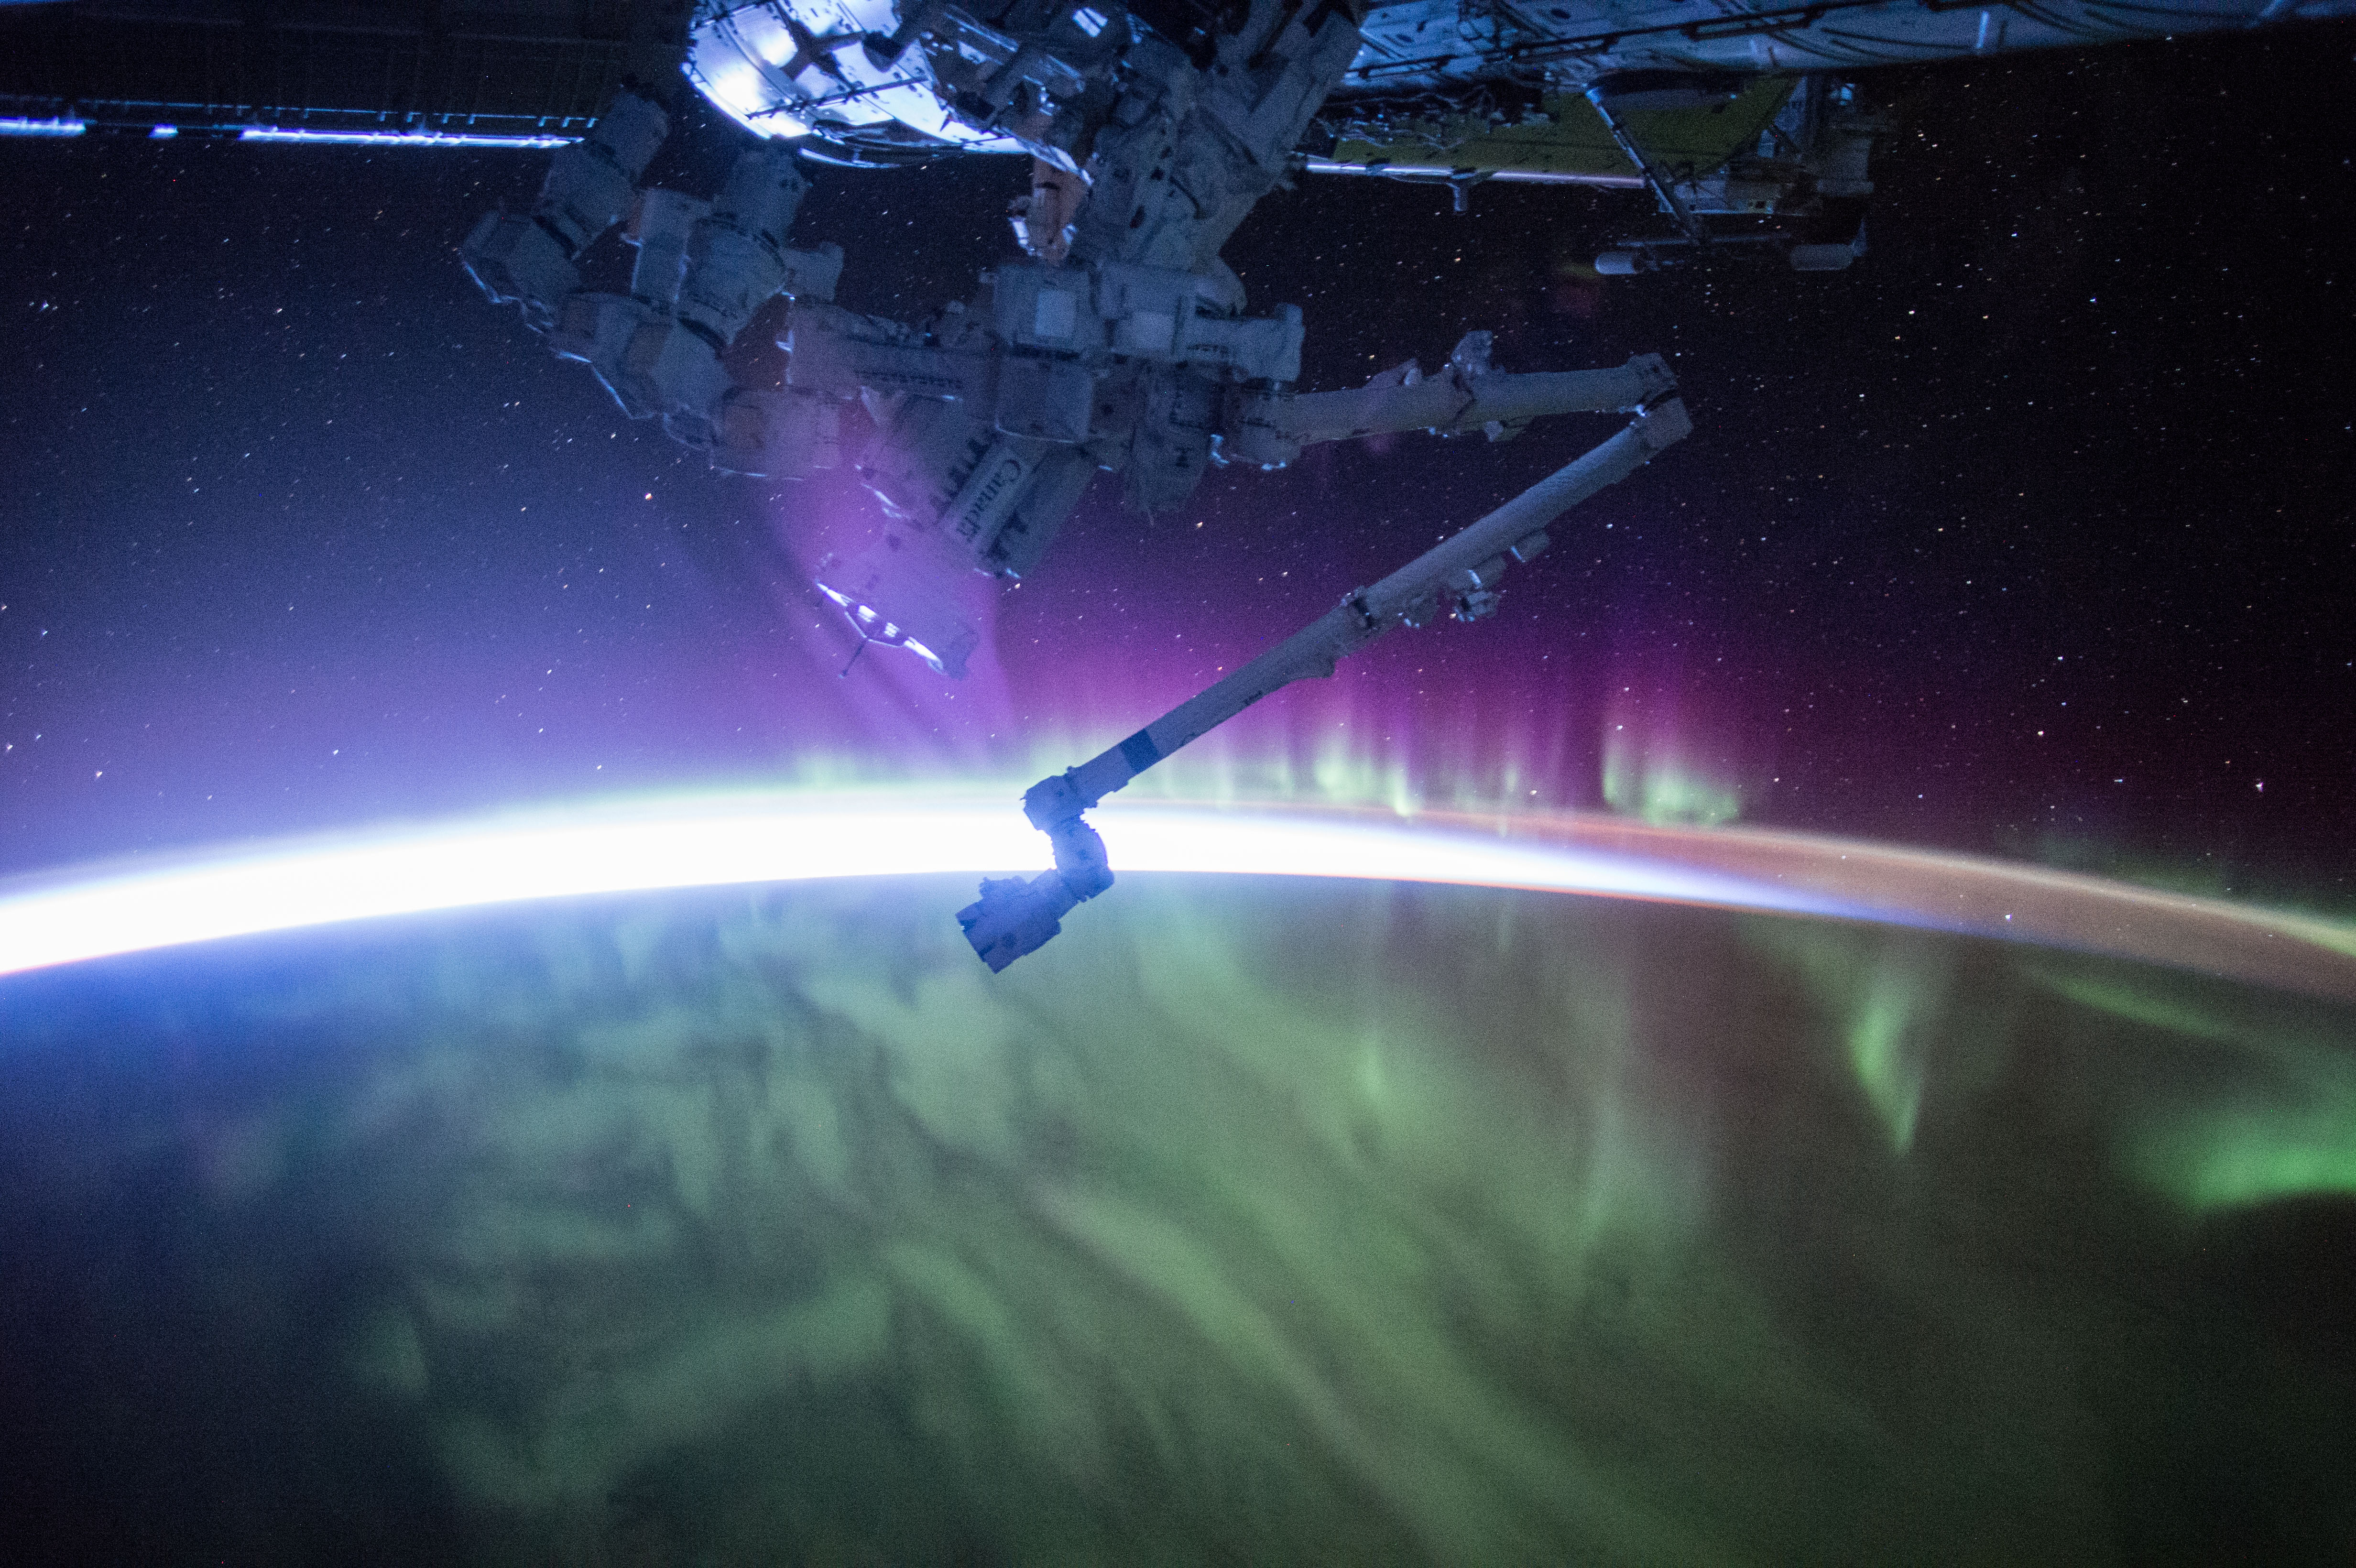 astronaut space radiation - photo #42